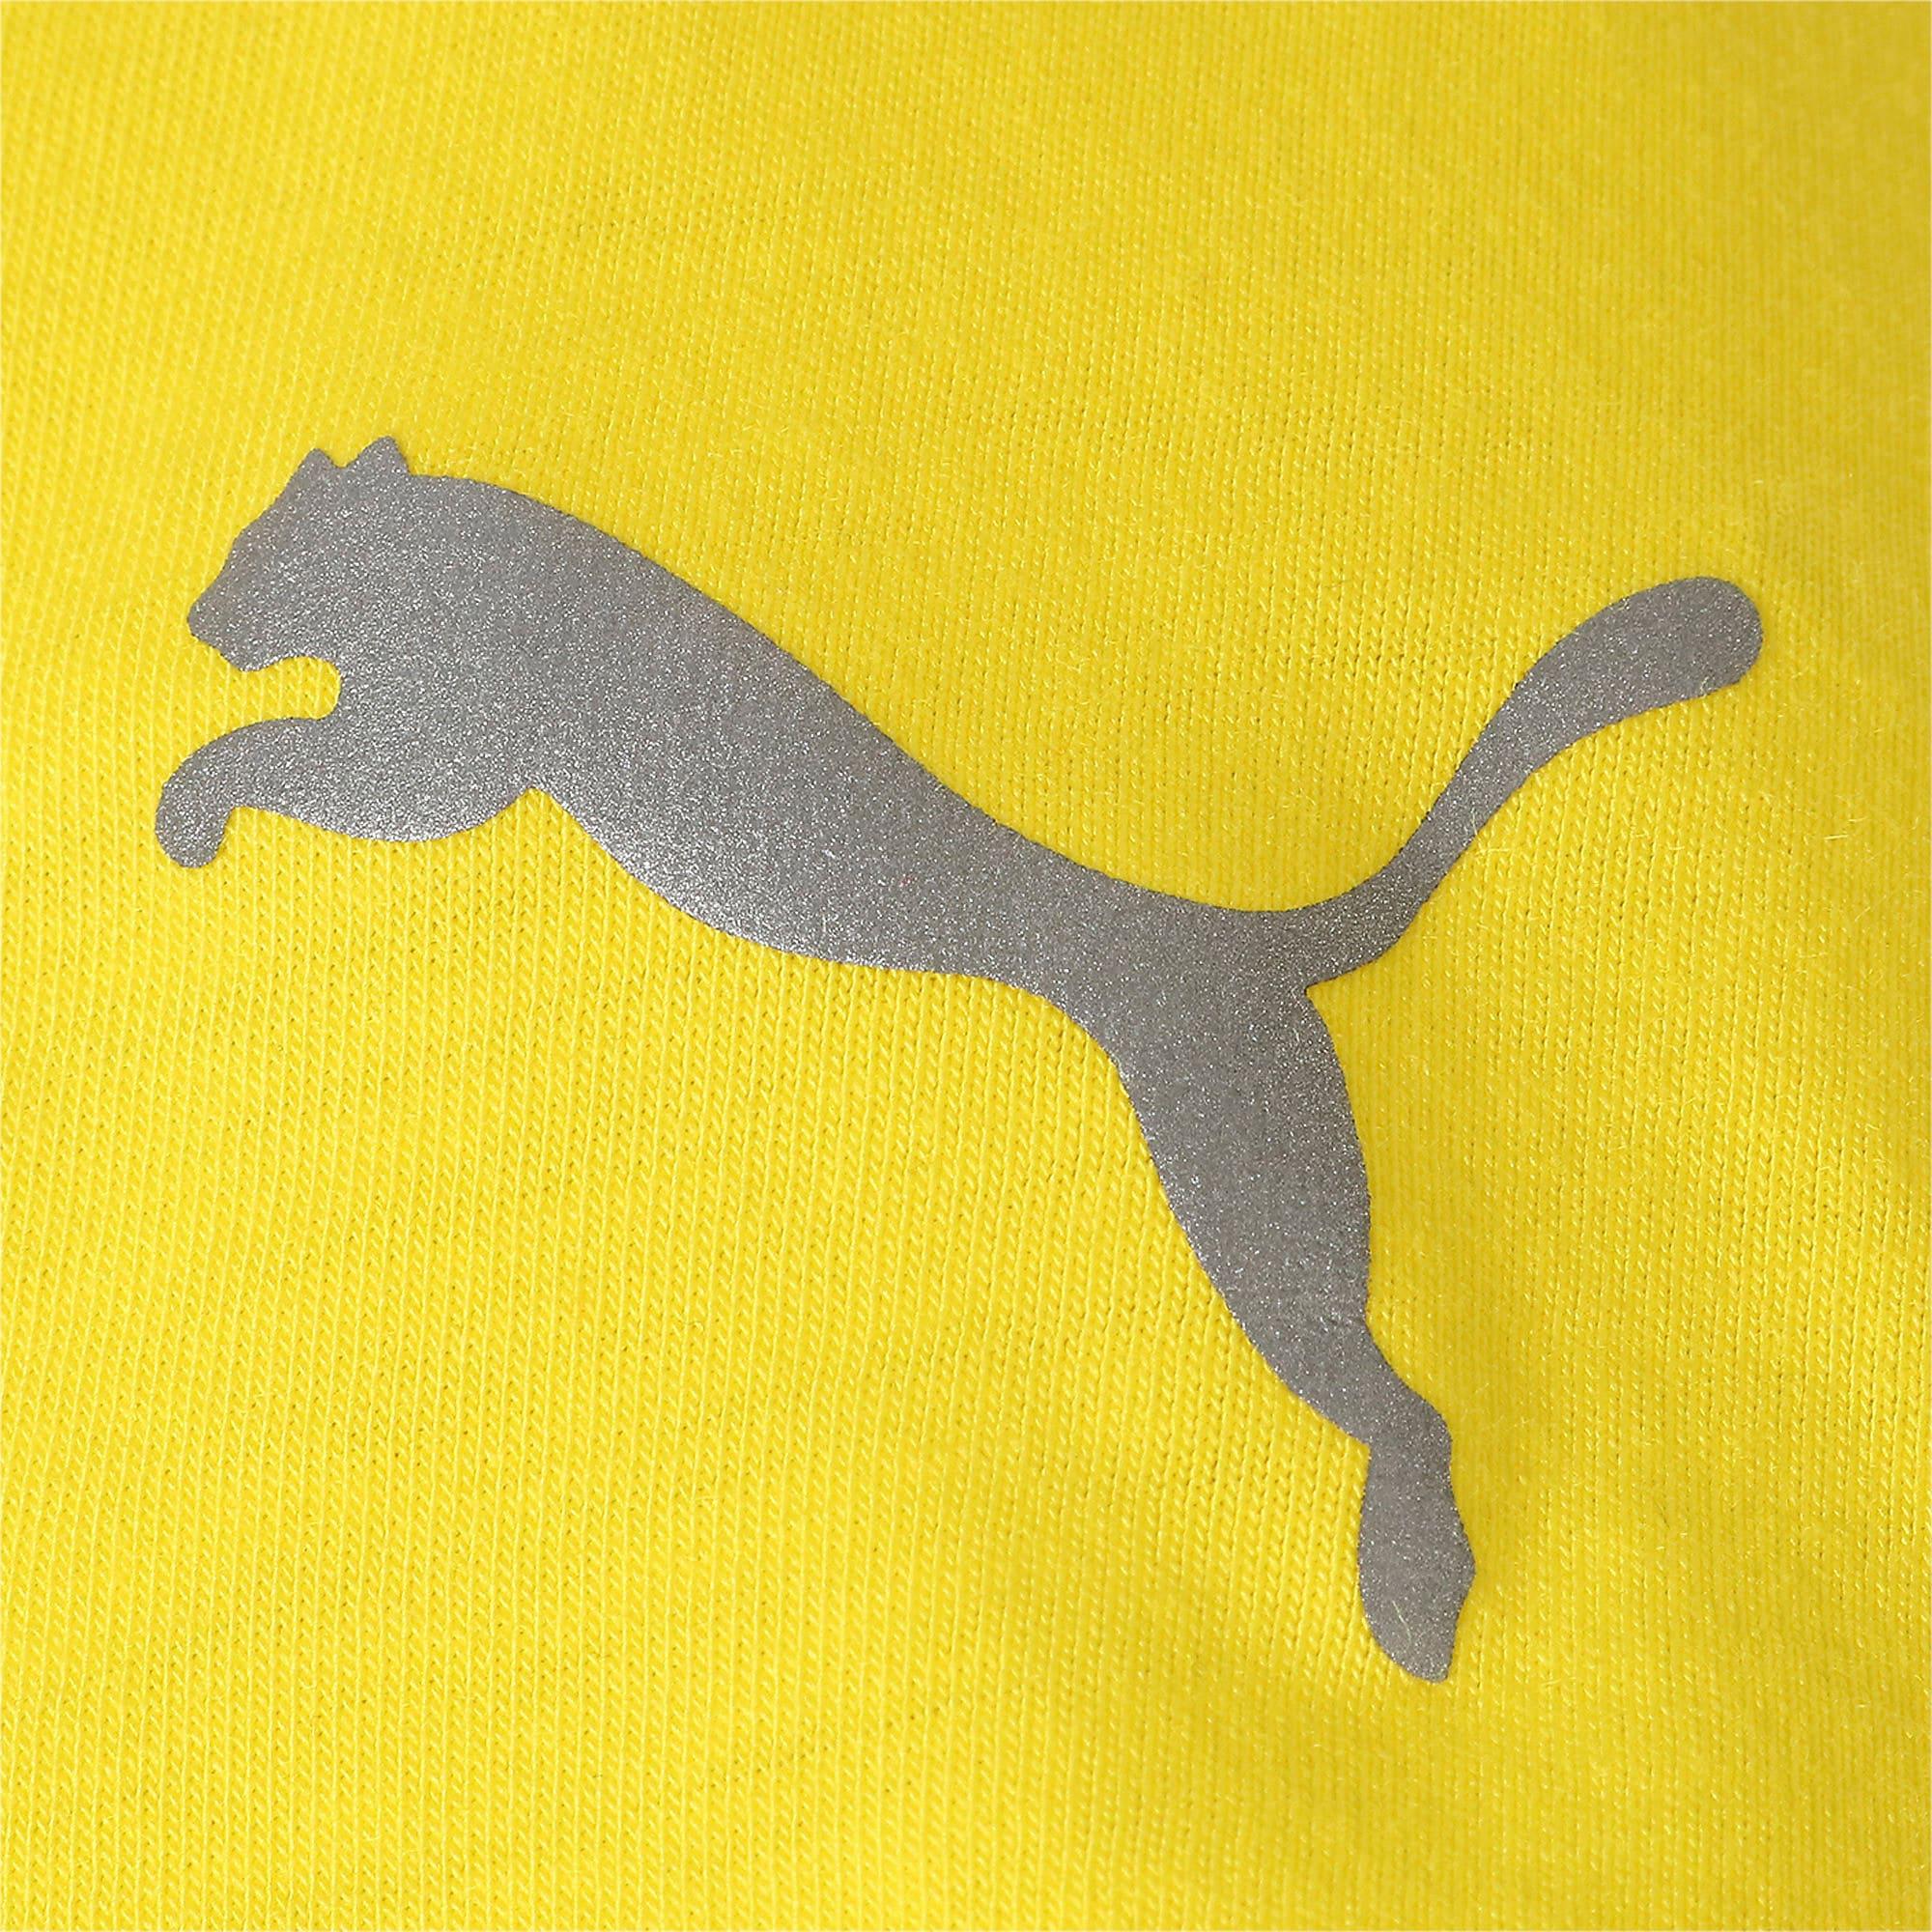 Thumbnail 4 of キッズ エナジー SS Tシャツ 半袖, Blazing Yellow, medium-JPN